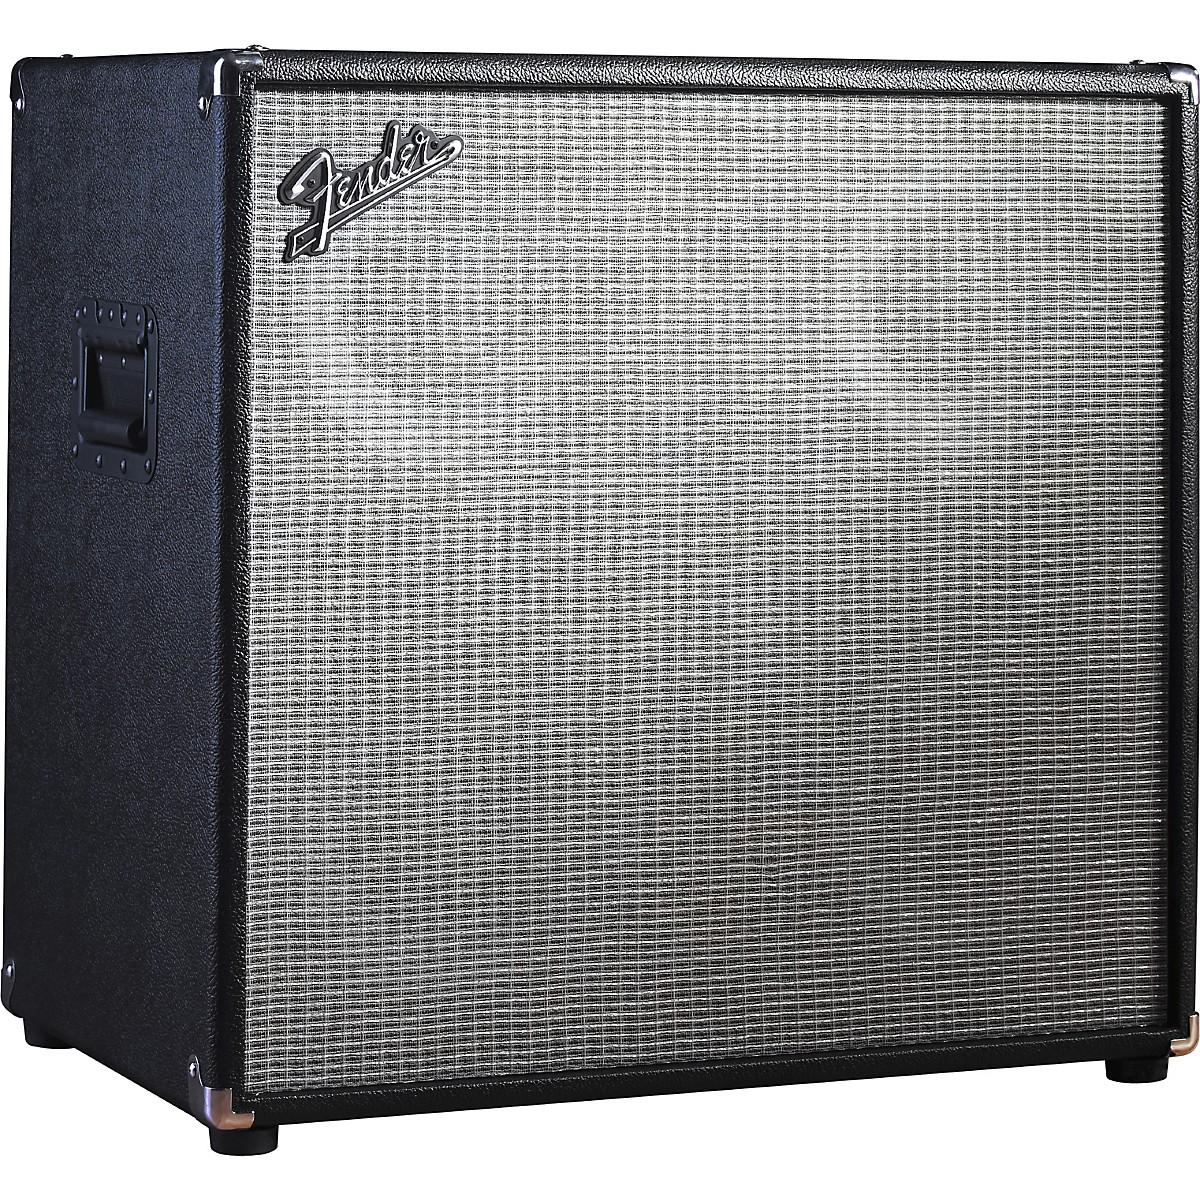 Fender Bassman Pro 410 4x10 Neo Bass Speaker Cabinet